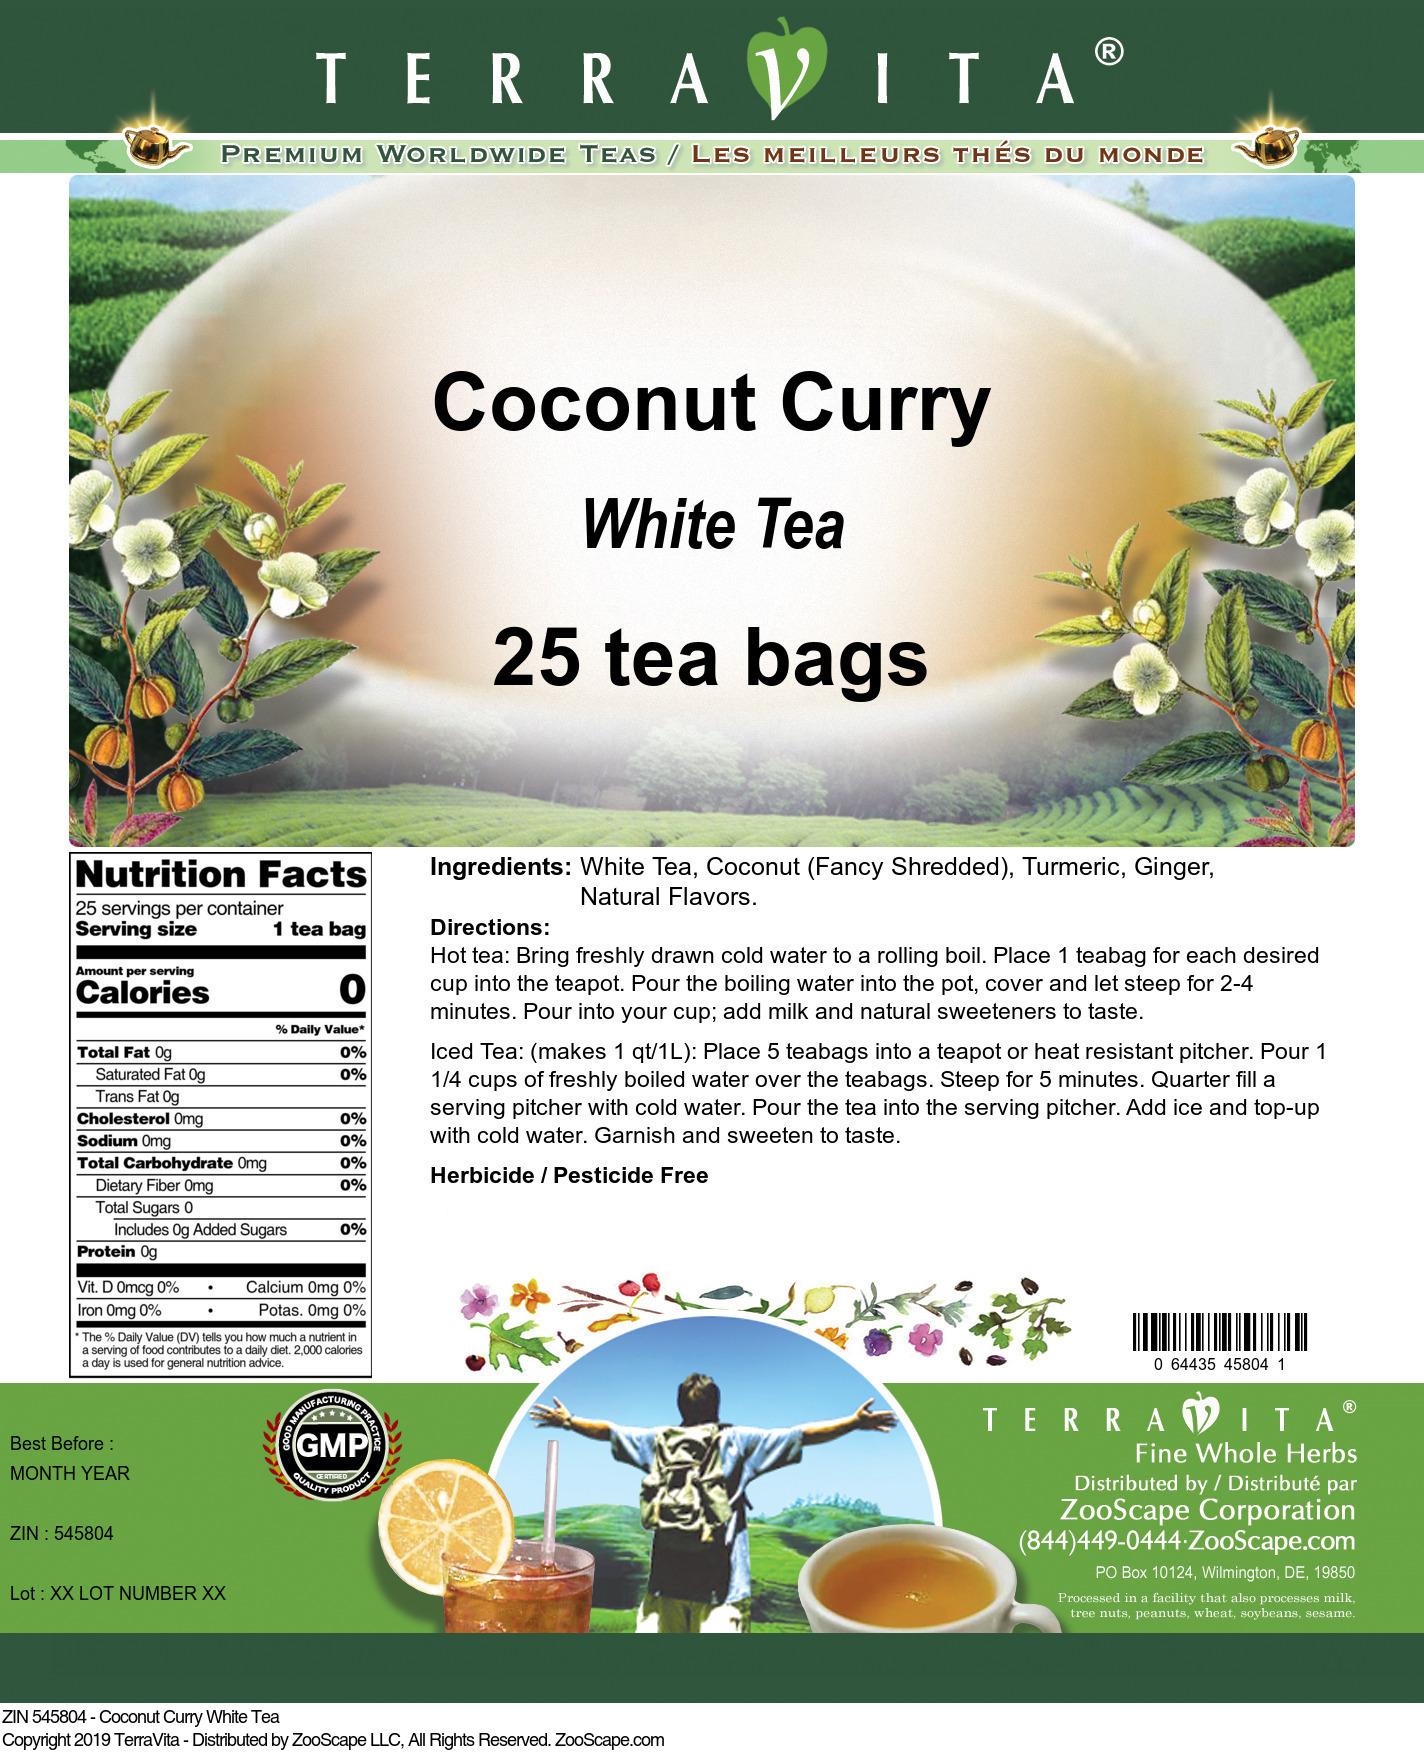 Coconut Curry White Tea